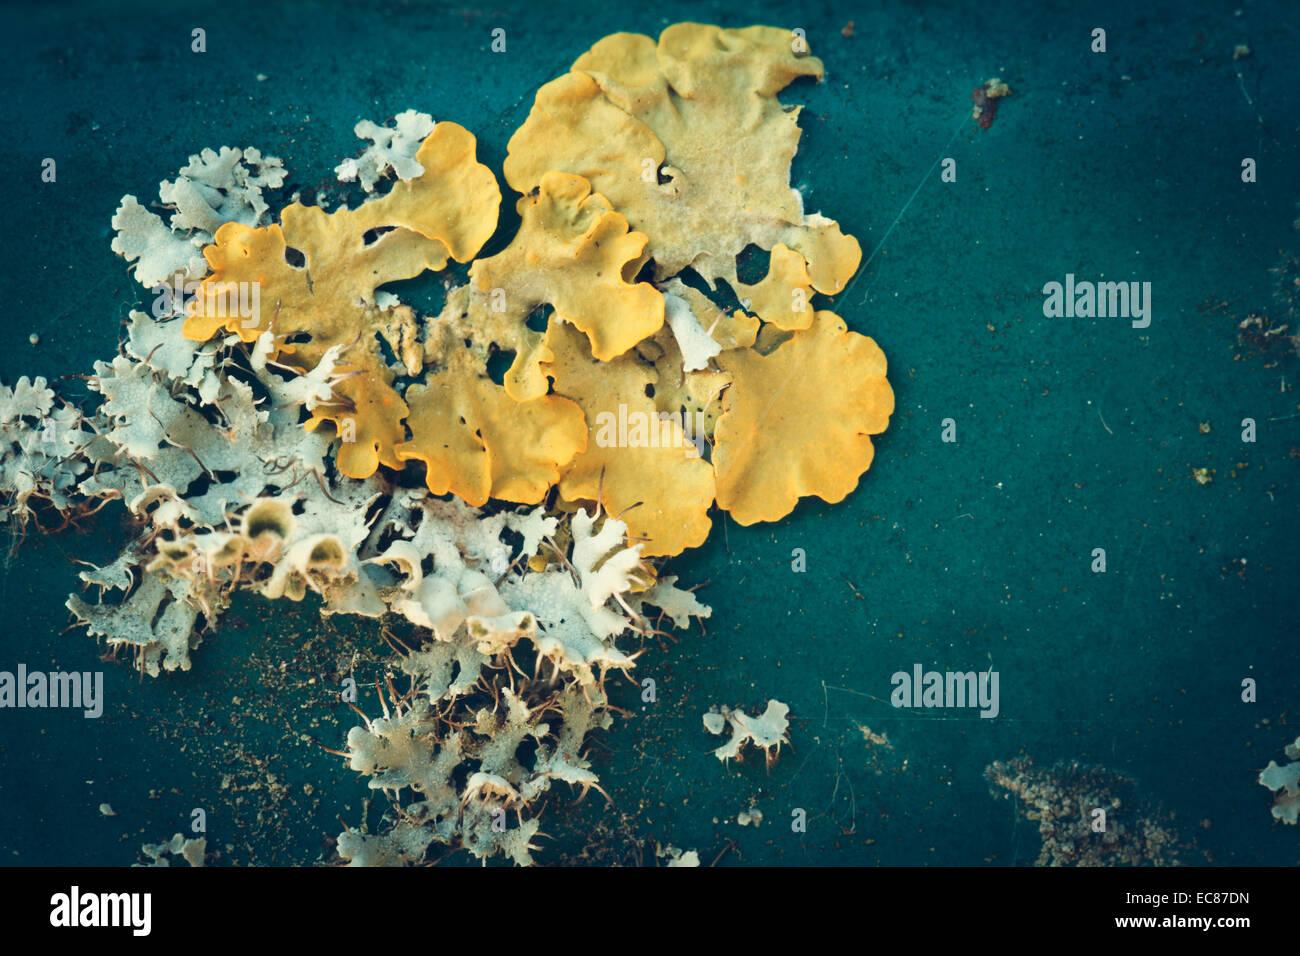 lichen on metal texture, close-up macro shot - Stock Image